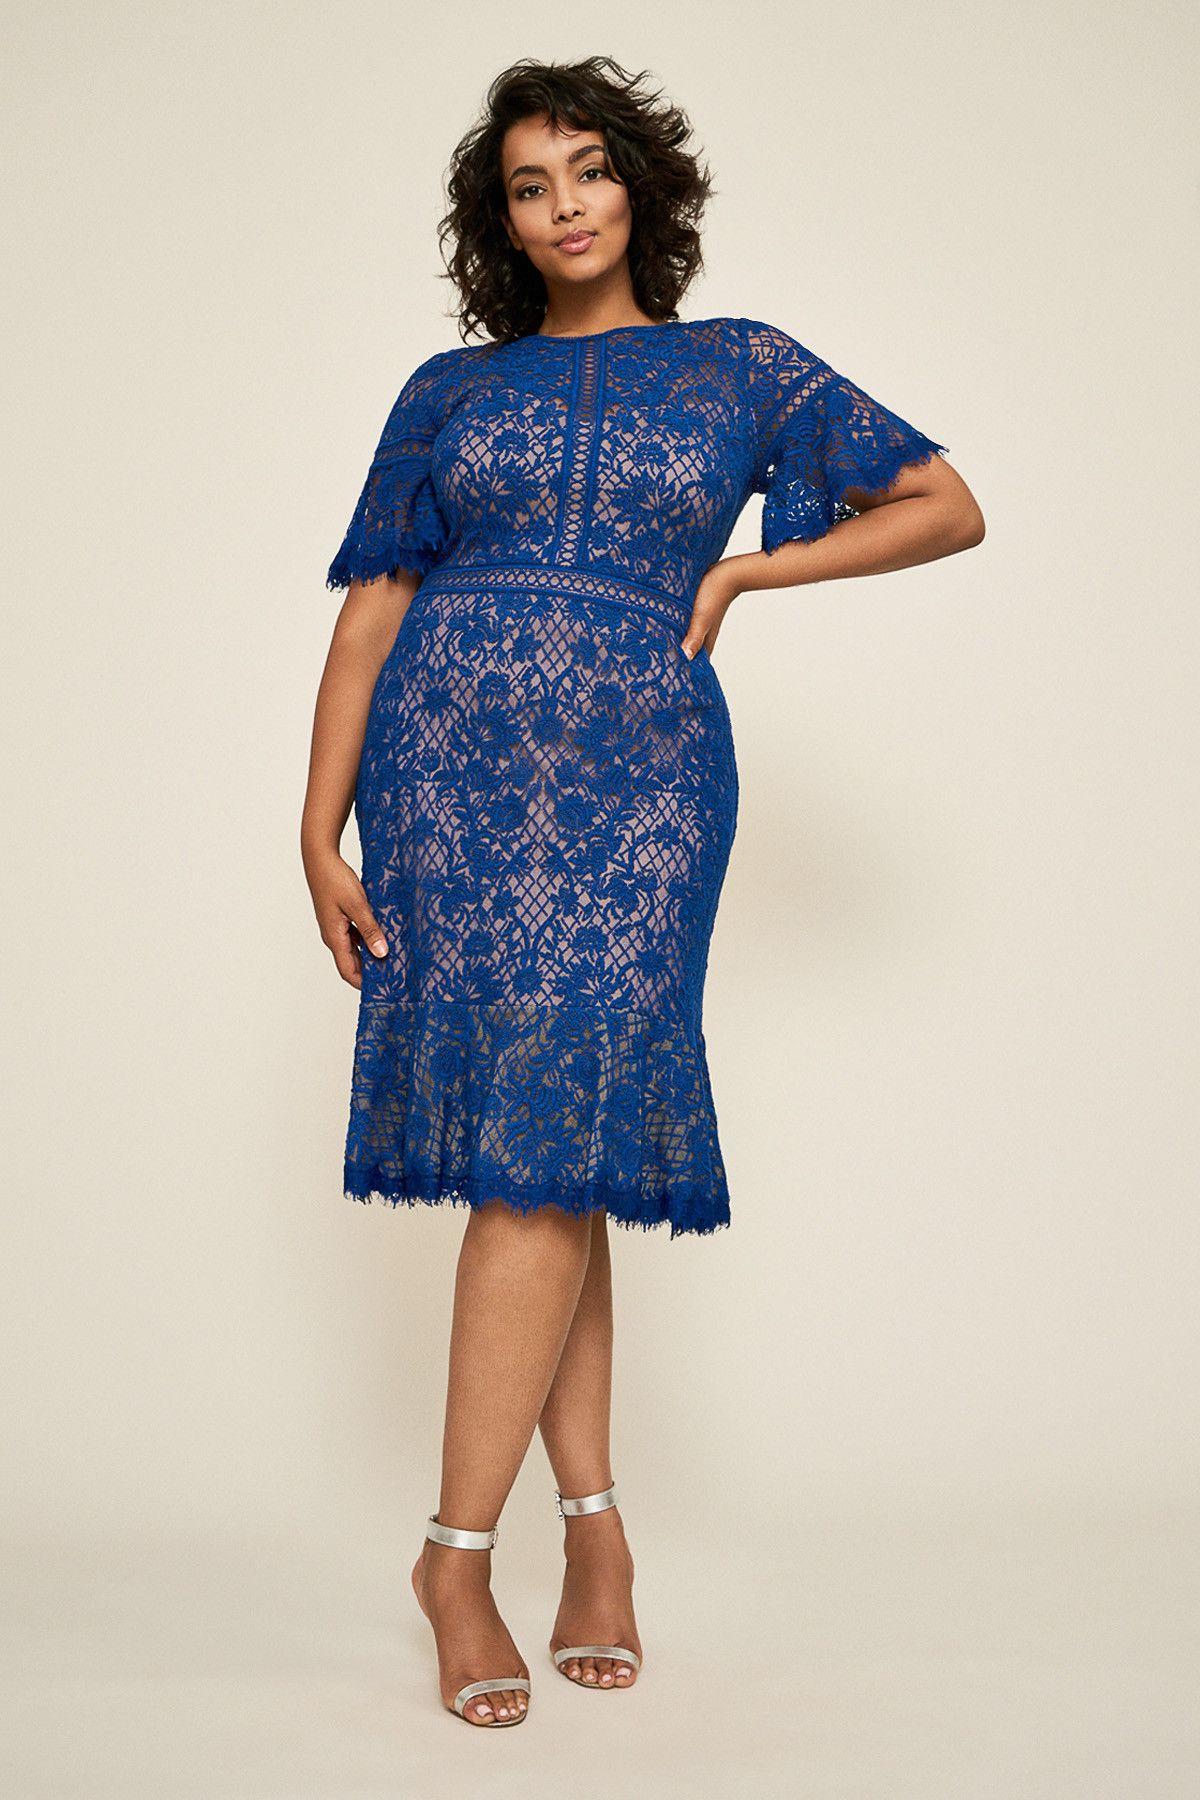 11335a154b0 Mirabelle Embroidered Dress - PLUS SIZE | Tadashi Shoji | Fashion ...